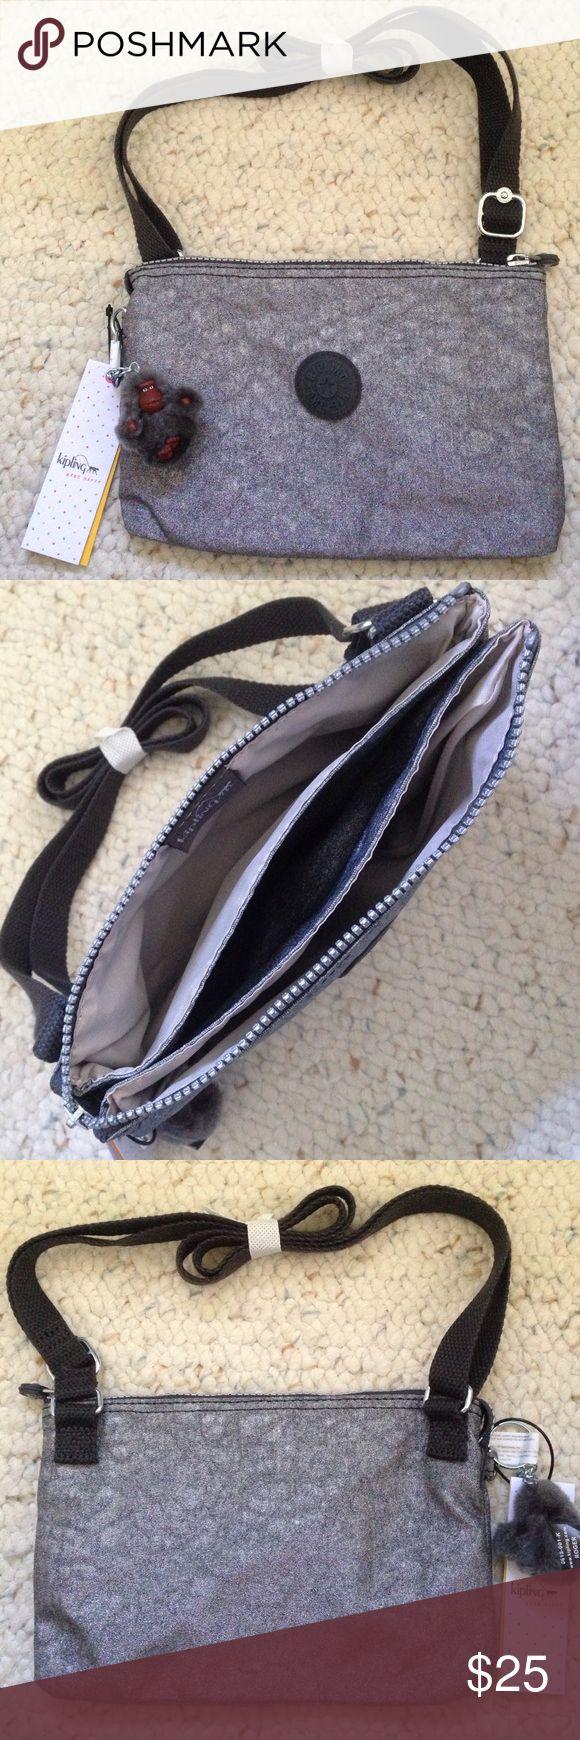 NEW Kipling bag New. Never used. Has 3 roomy, wide pockets. Kipling Bags Crossbody Bags